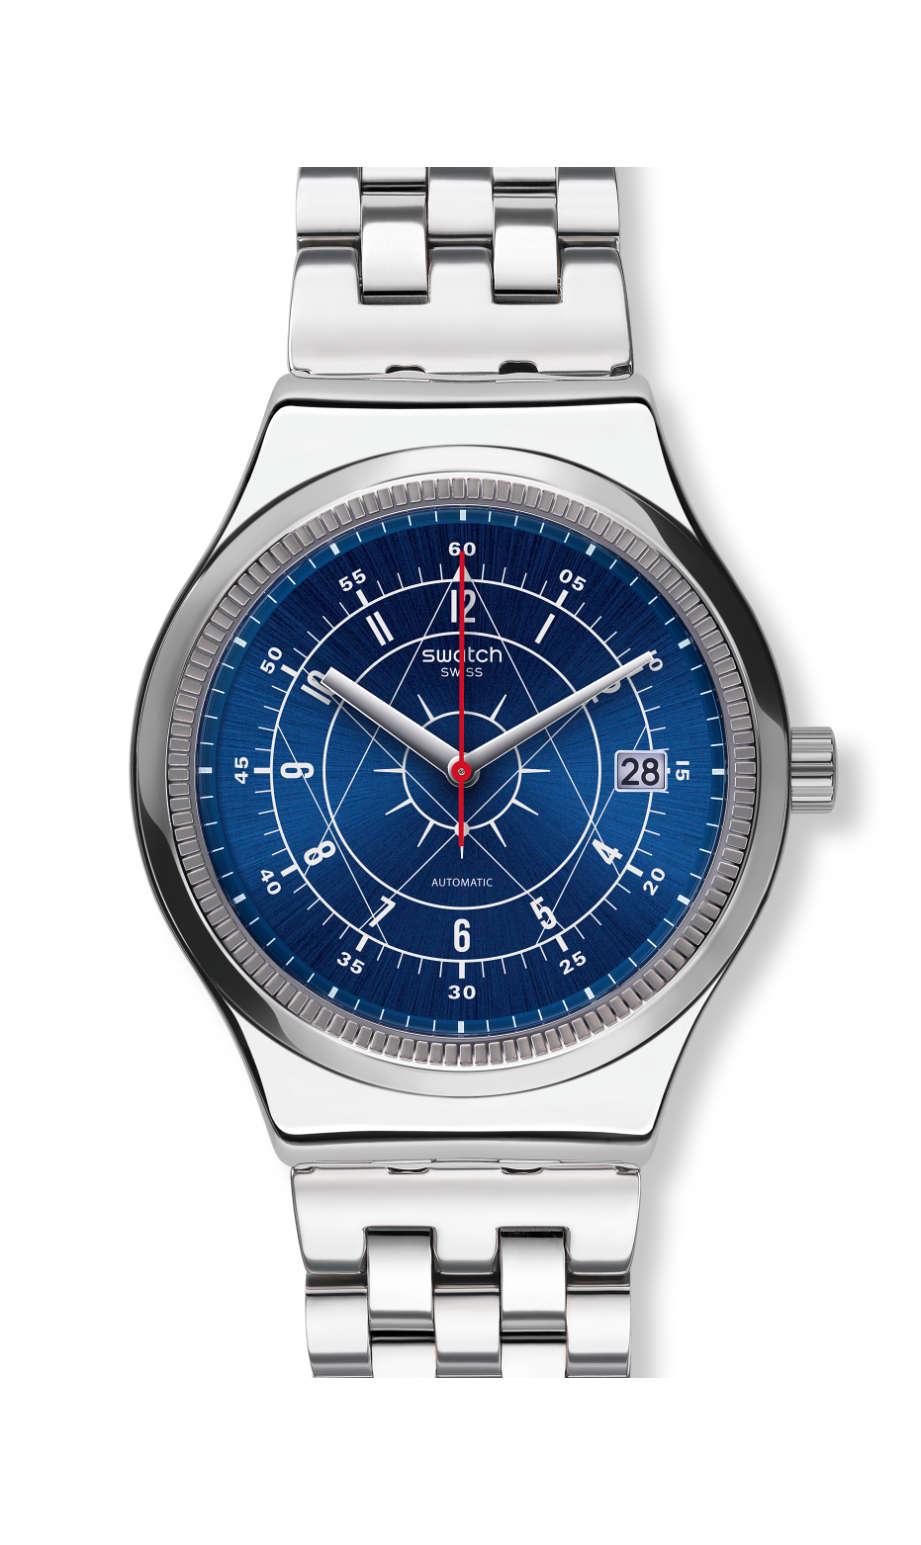 Swatch - SISTEM BOREAL - 1